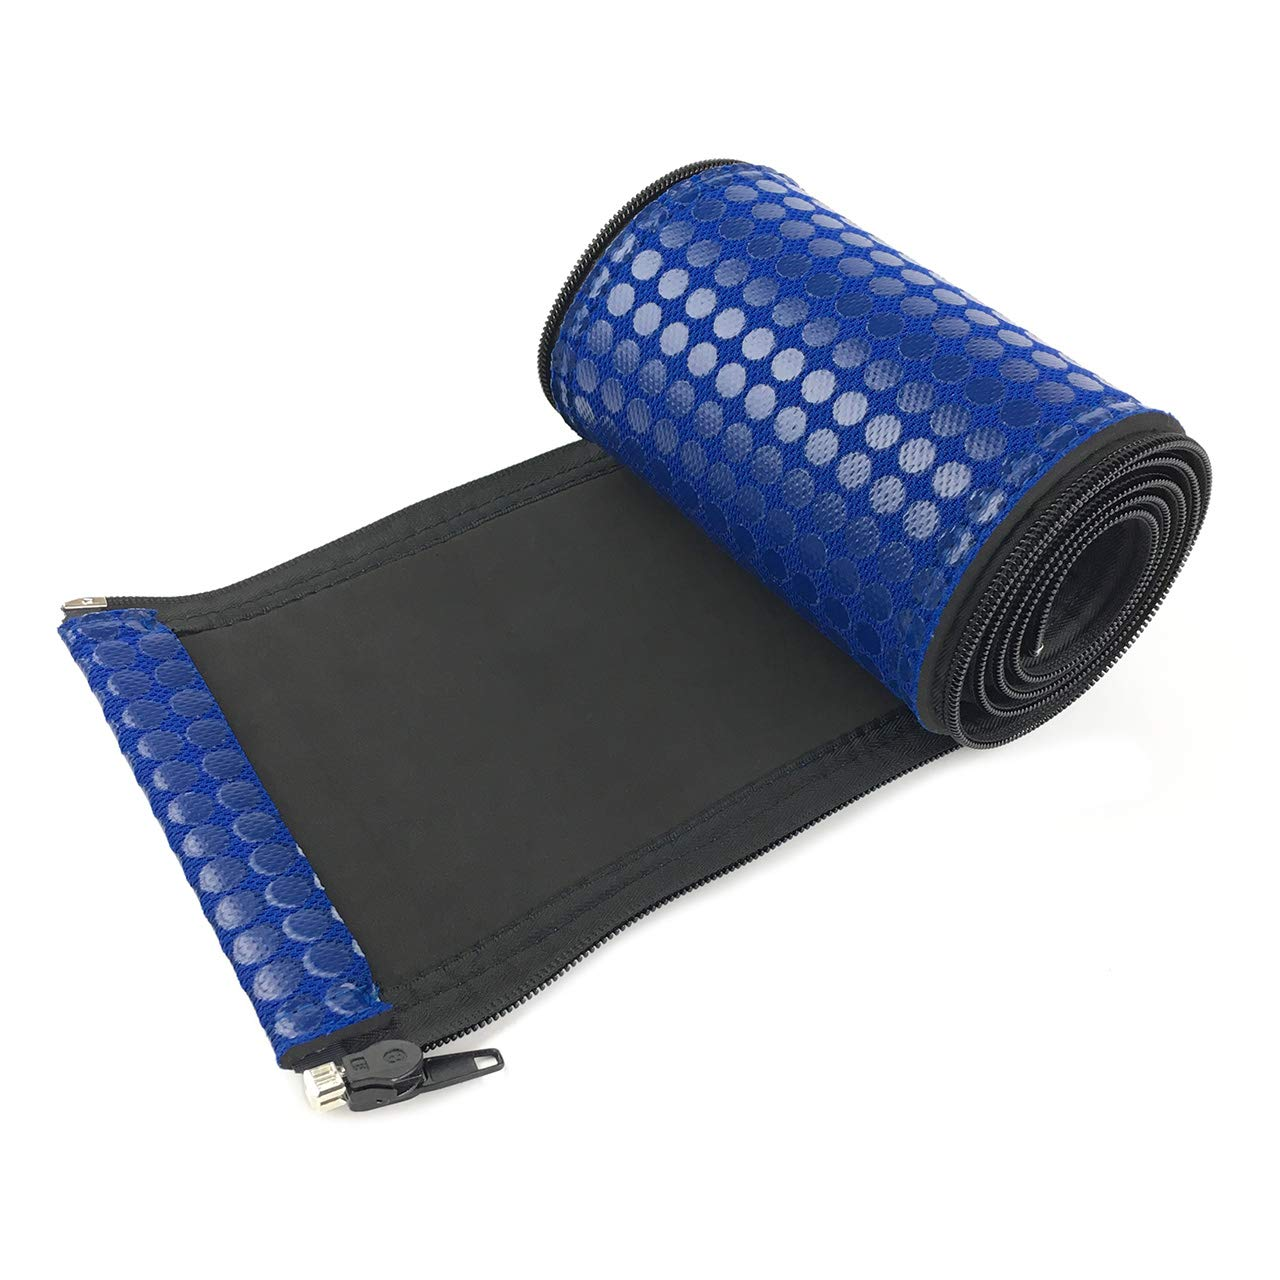 4 feet Blue Pokin Swimming Pool Handrail Grip Cover